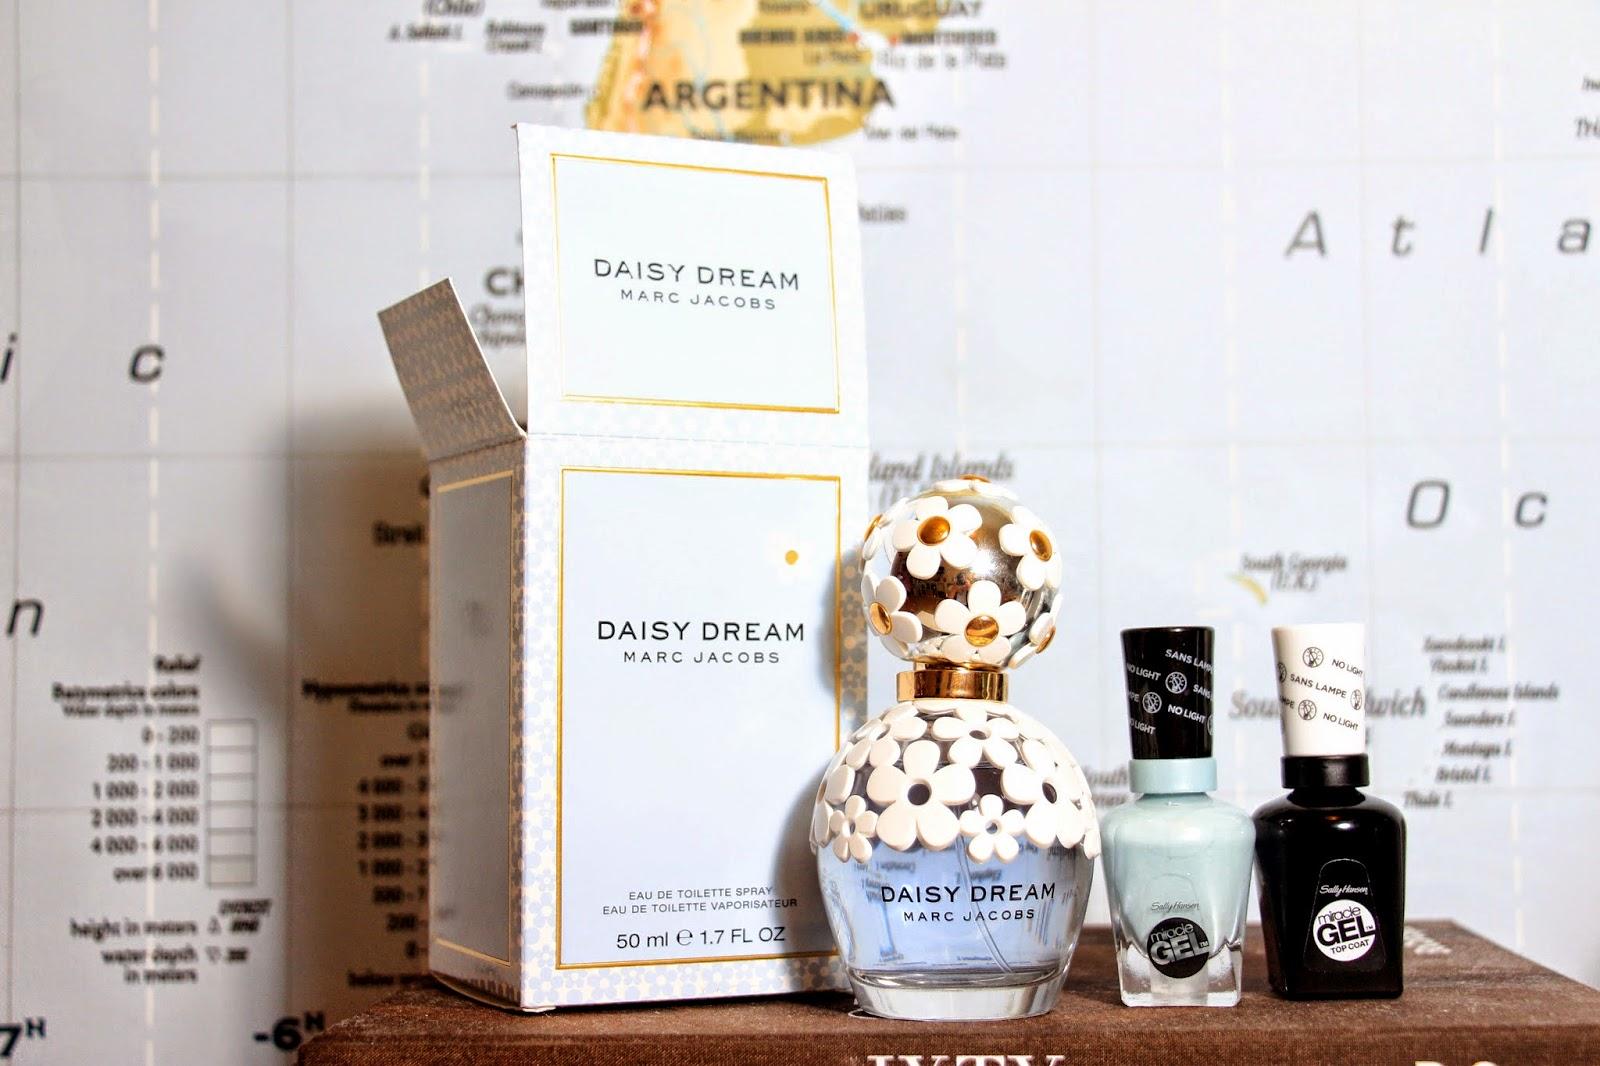 daidy dream marc jacobs, perfume 2014, summer perfumme, daisy dream, marc jabobs